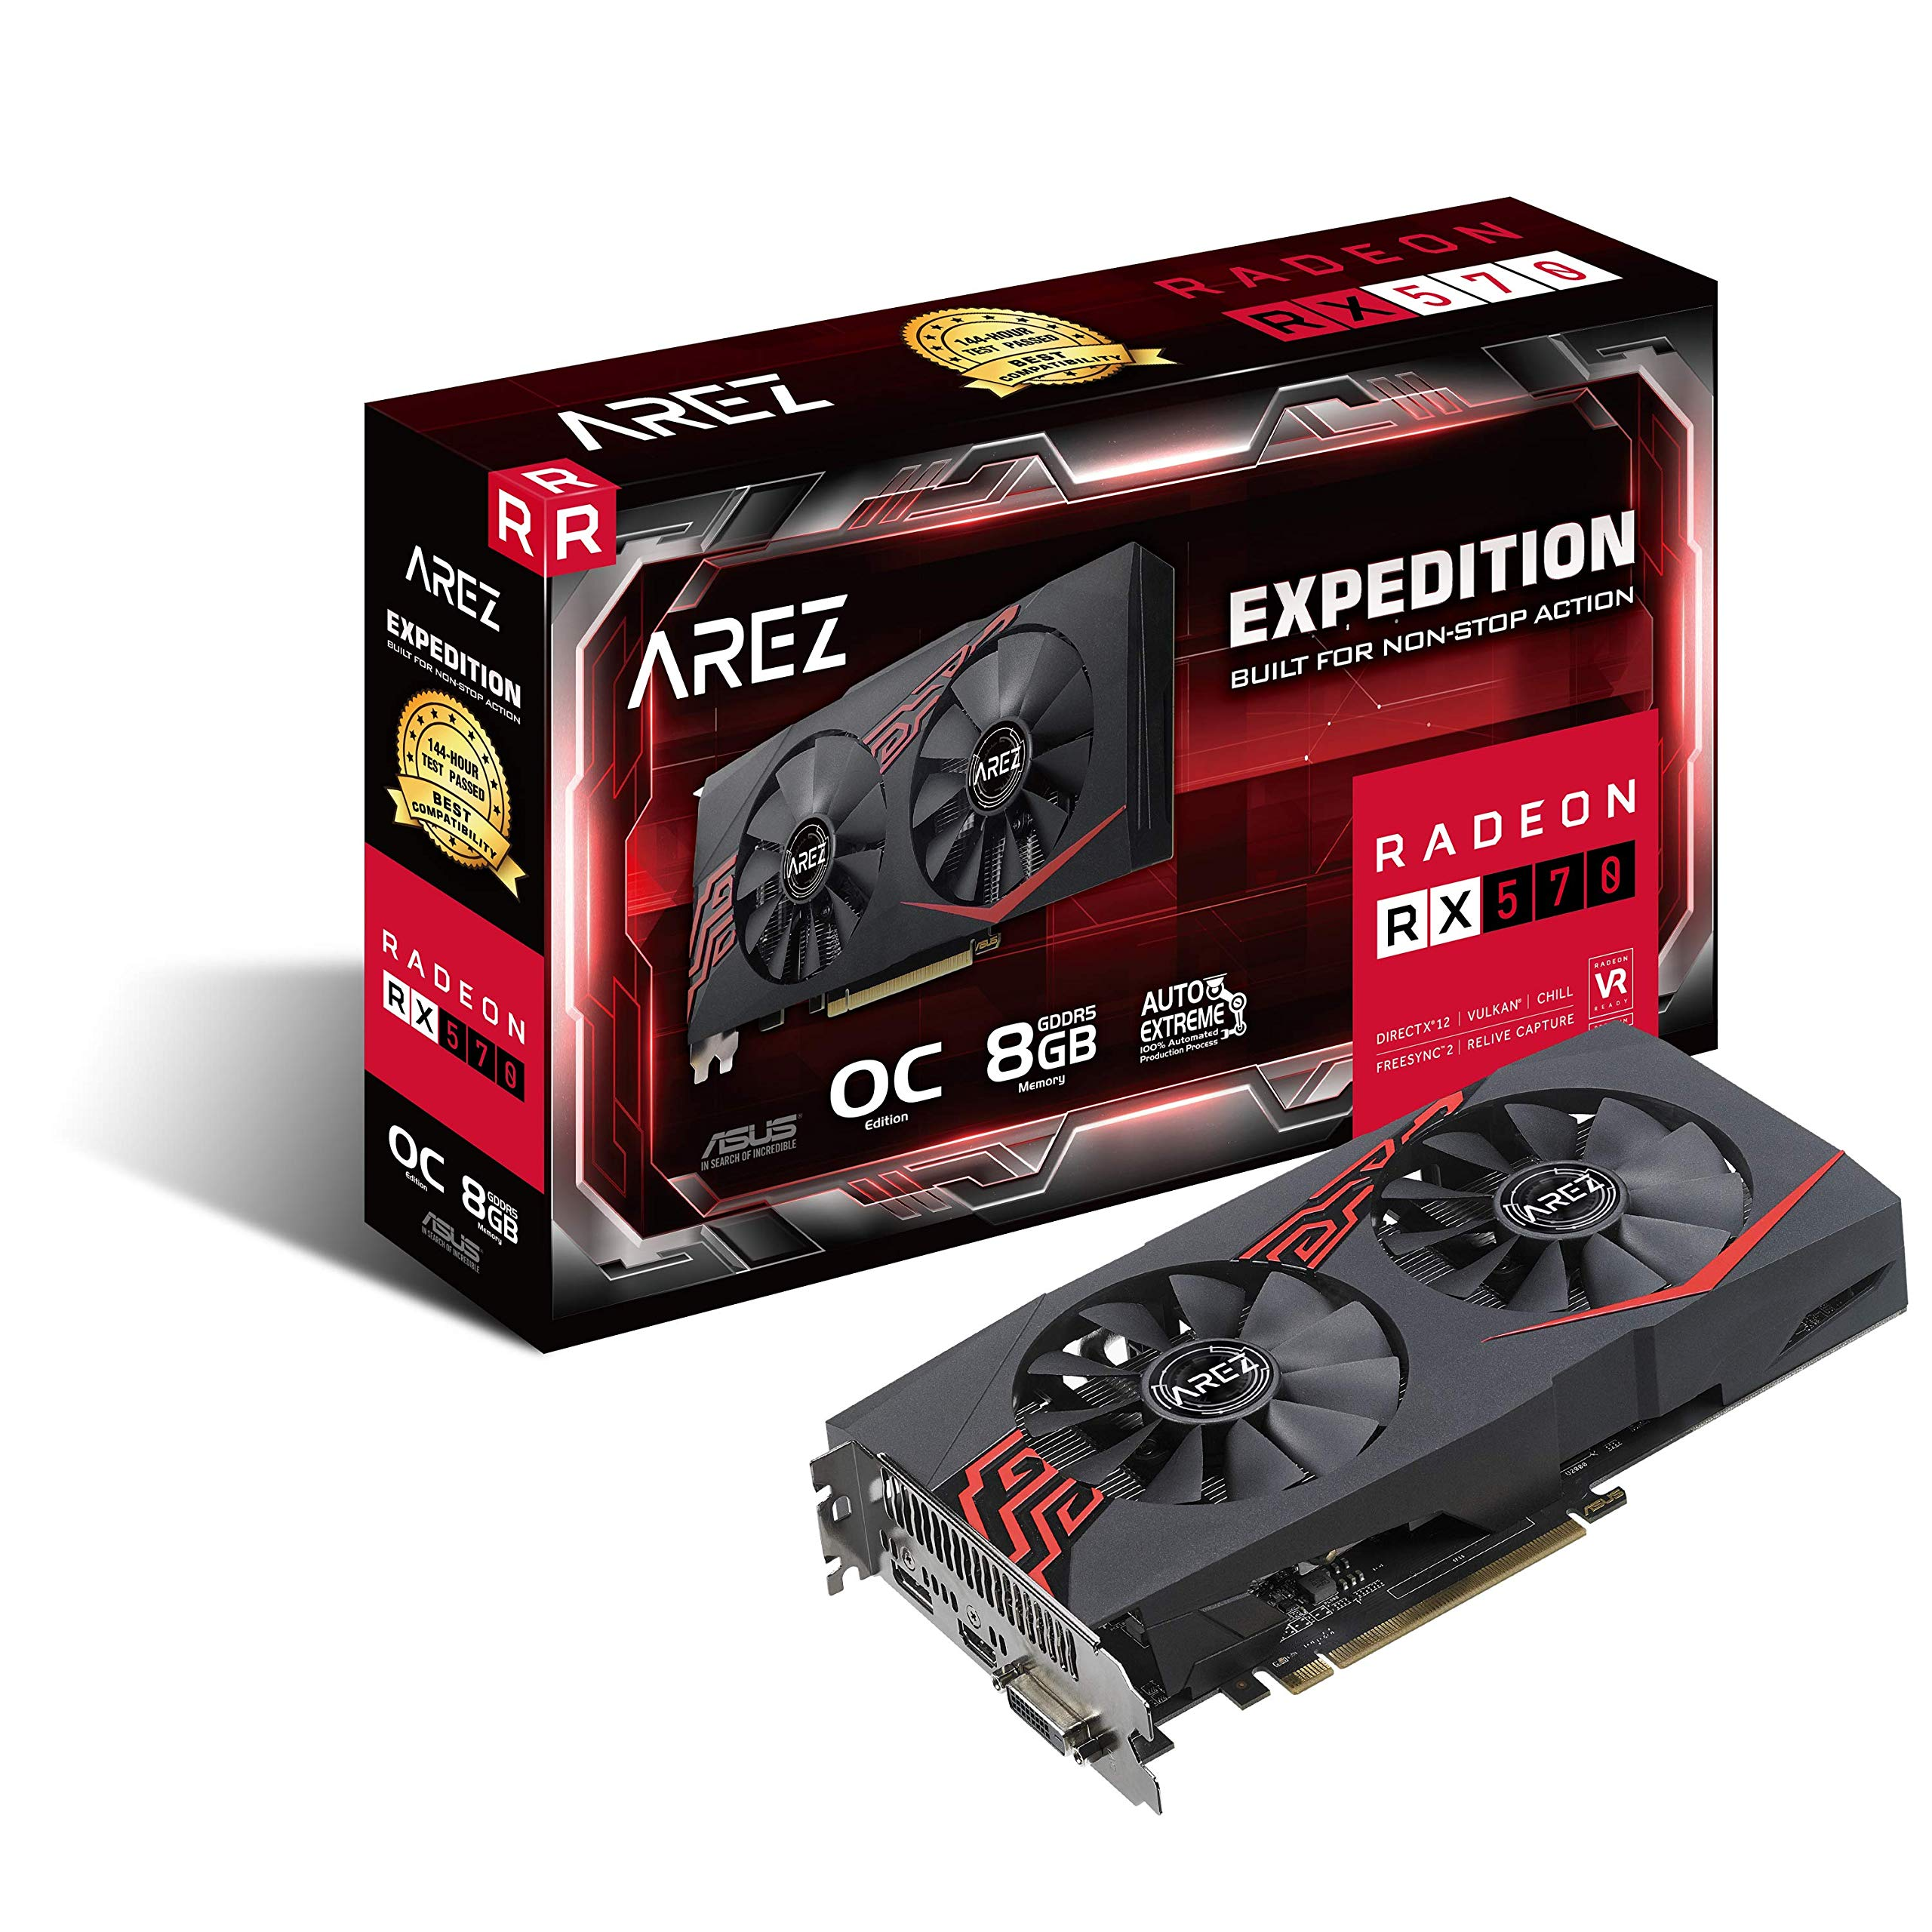 ASUS Expedition Radeon RX 570 8GB OC Edition Gaming GDDR5 DP HDMI DVI VR Ready AMD Graphics Card (EX-RX570-O8G)